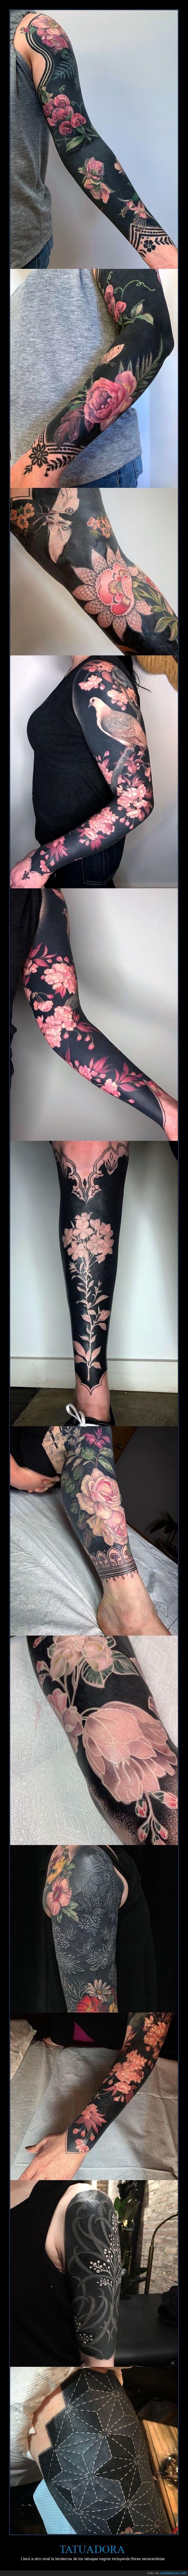 flores renacentistas,negros,tatuadora,tatuajes